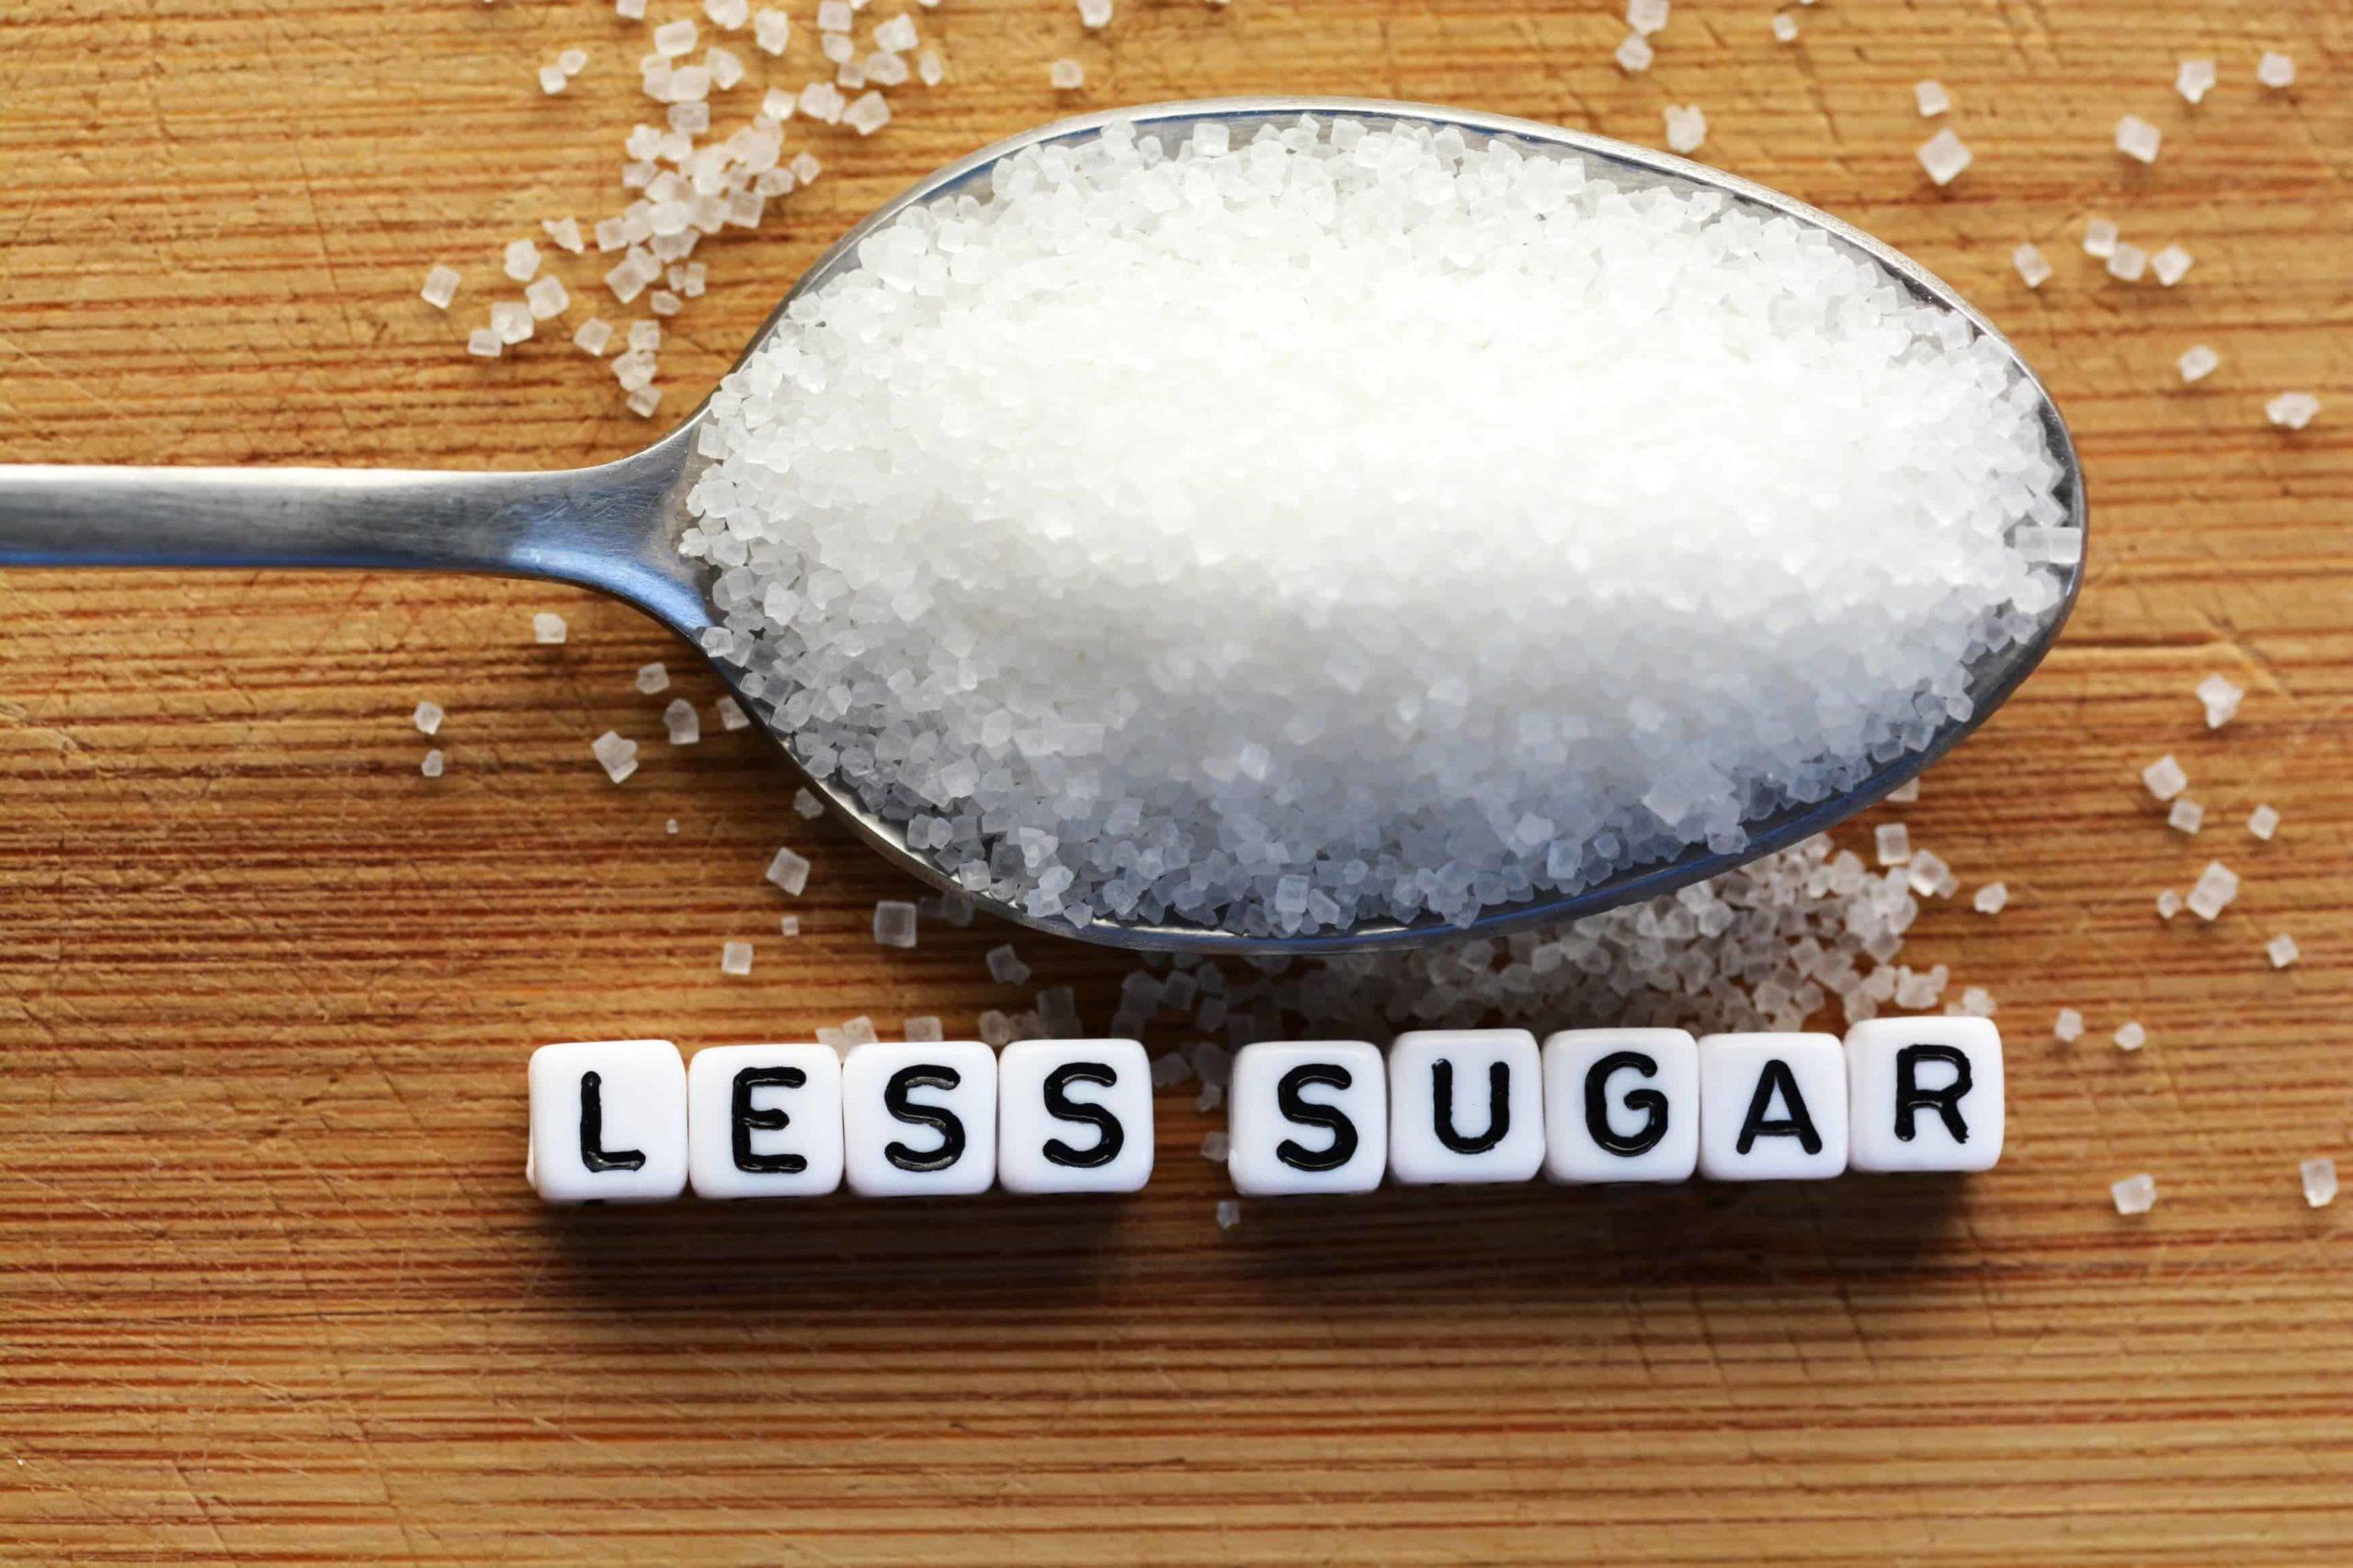 Put A Limit On The Sugar Intake